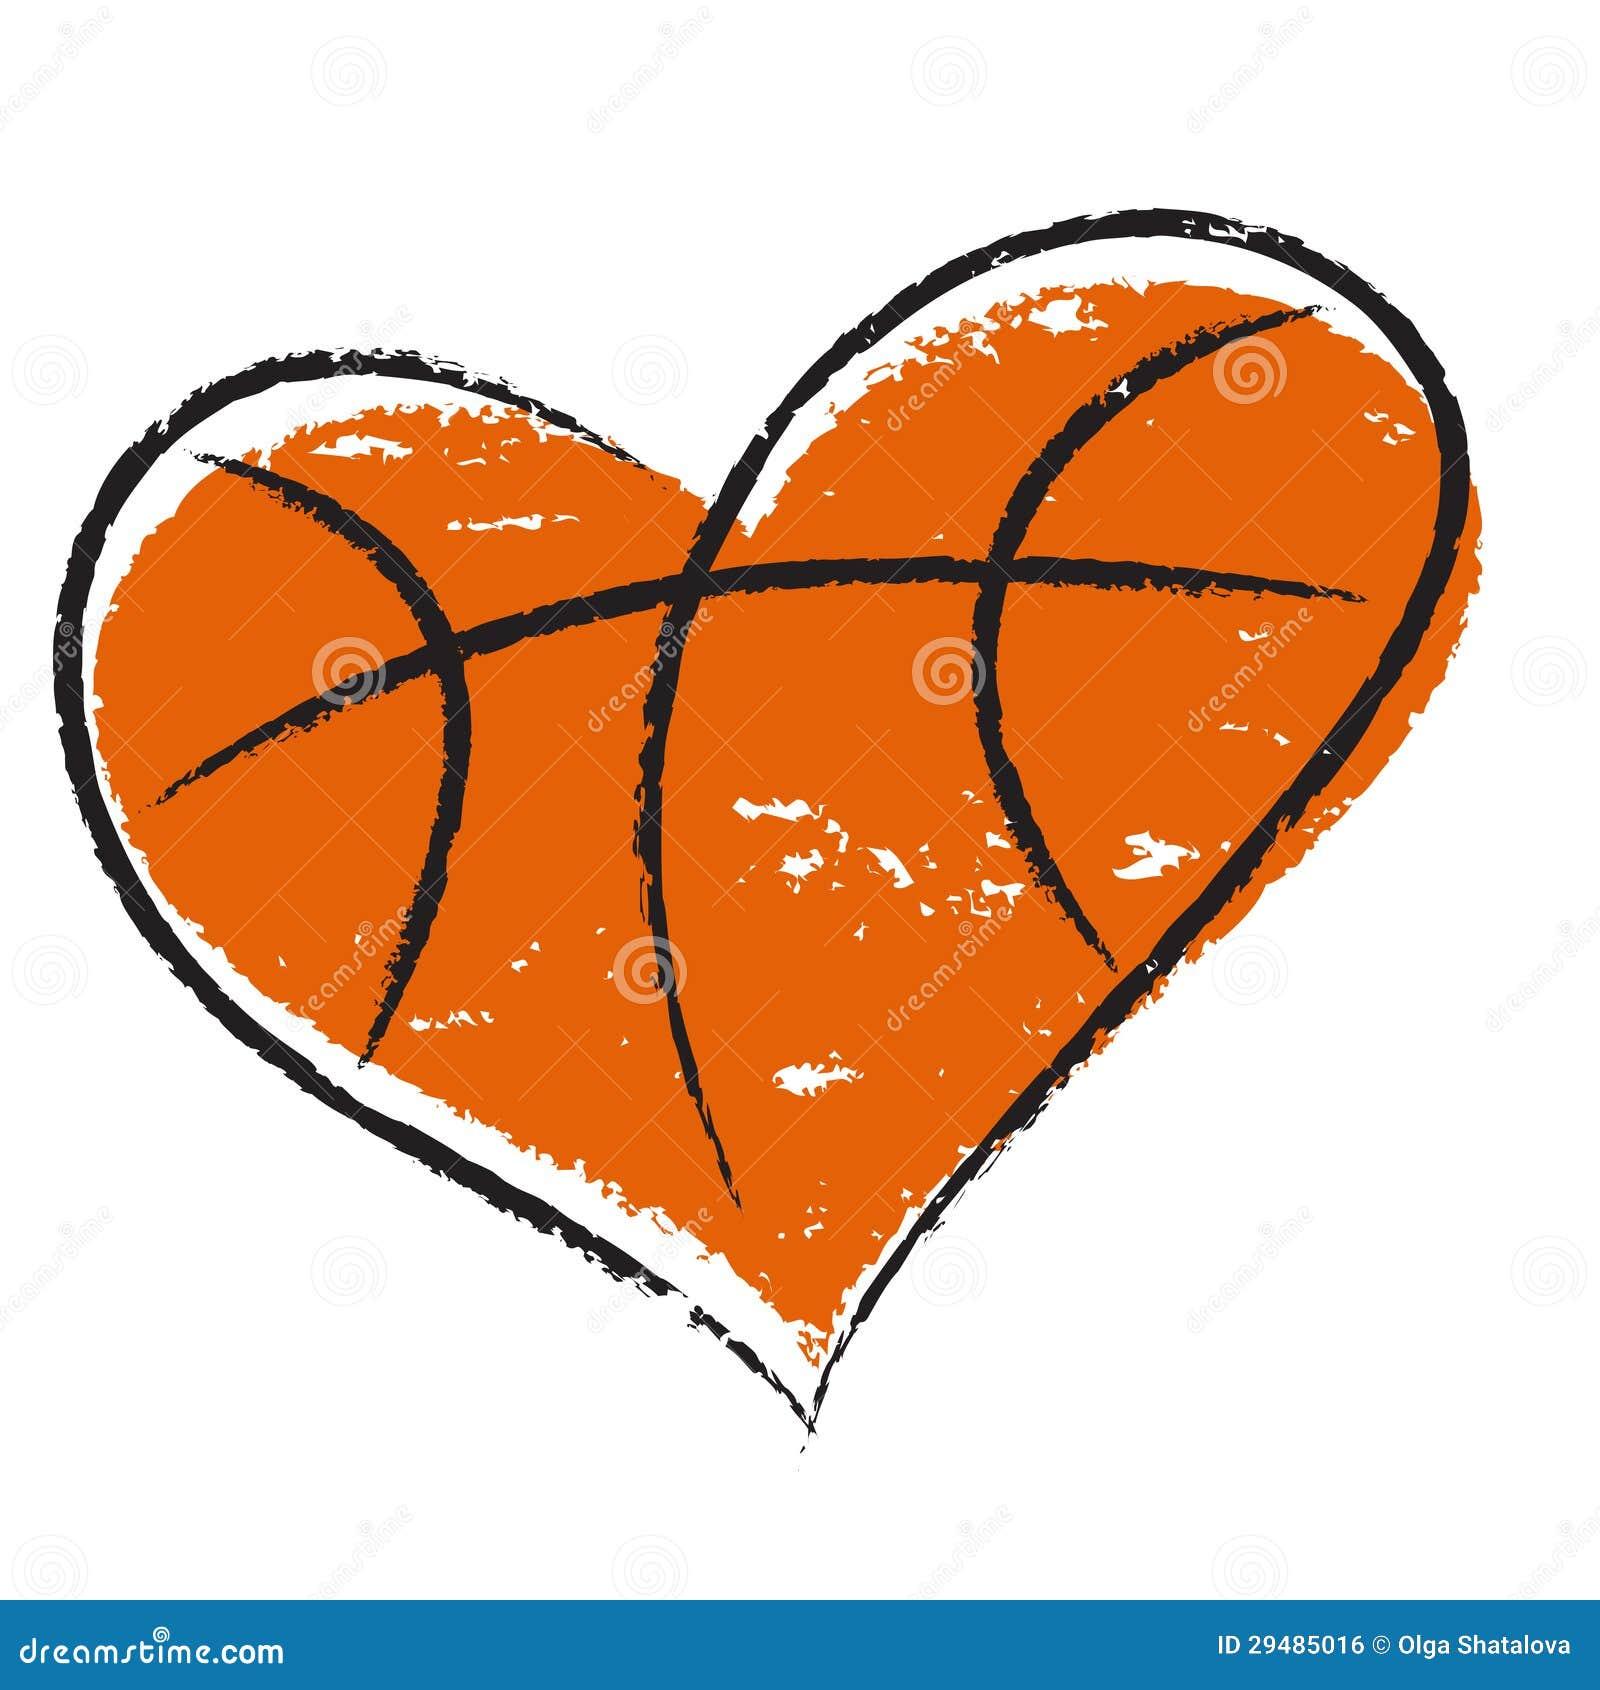 Basketball Heart Stock Vector Illustration Of Isolated 29485016